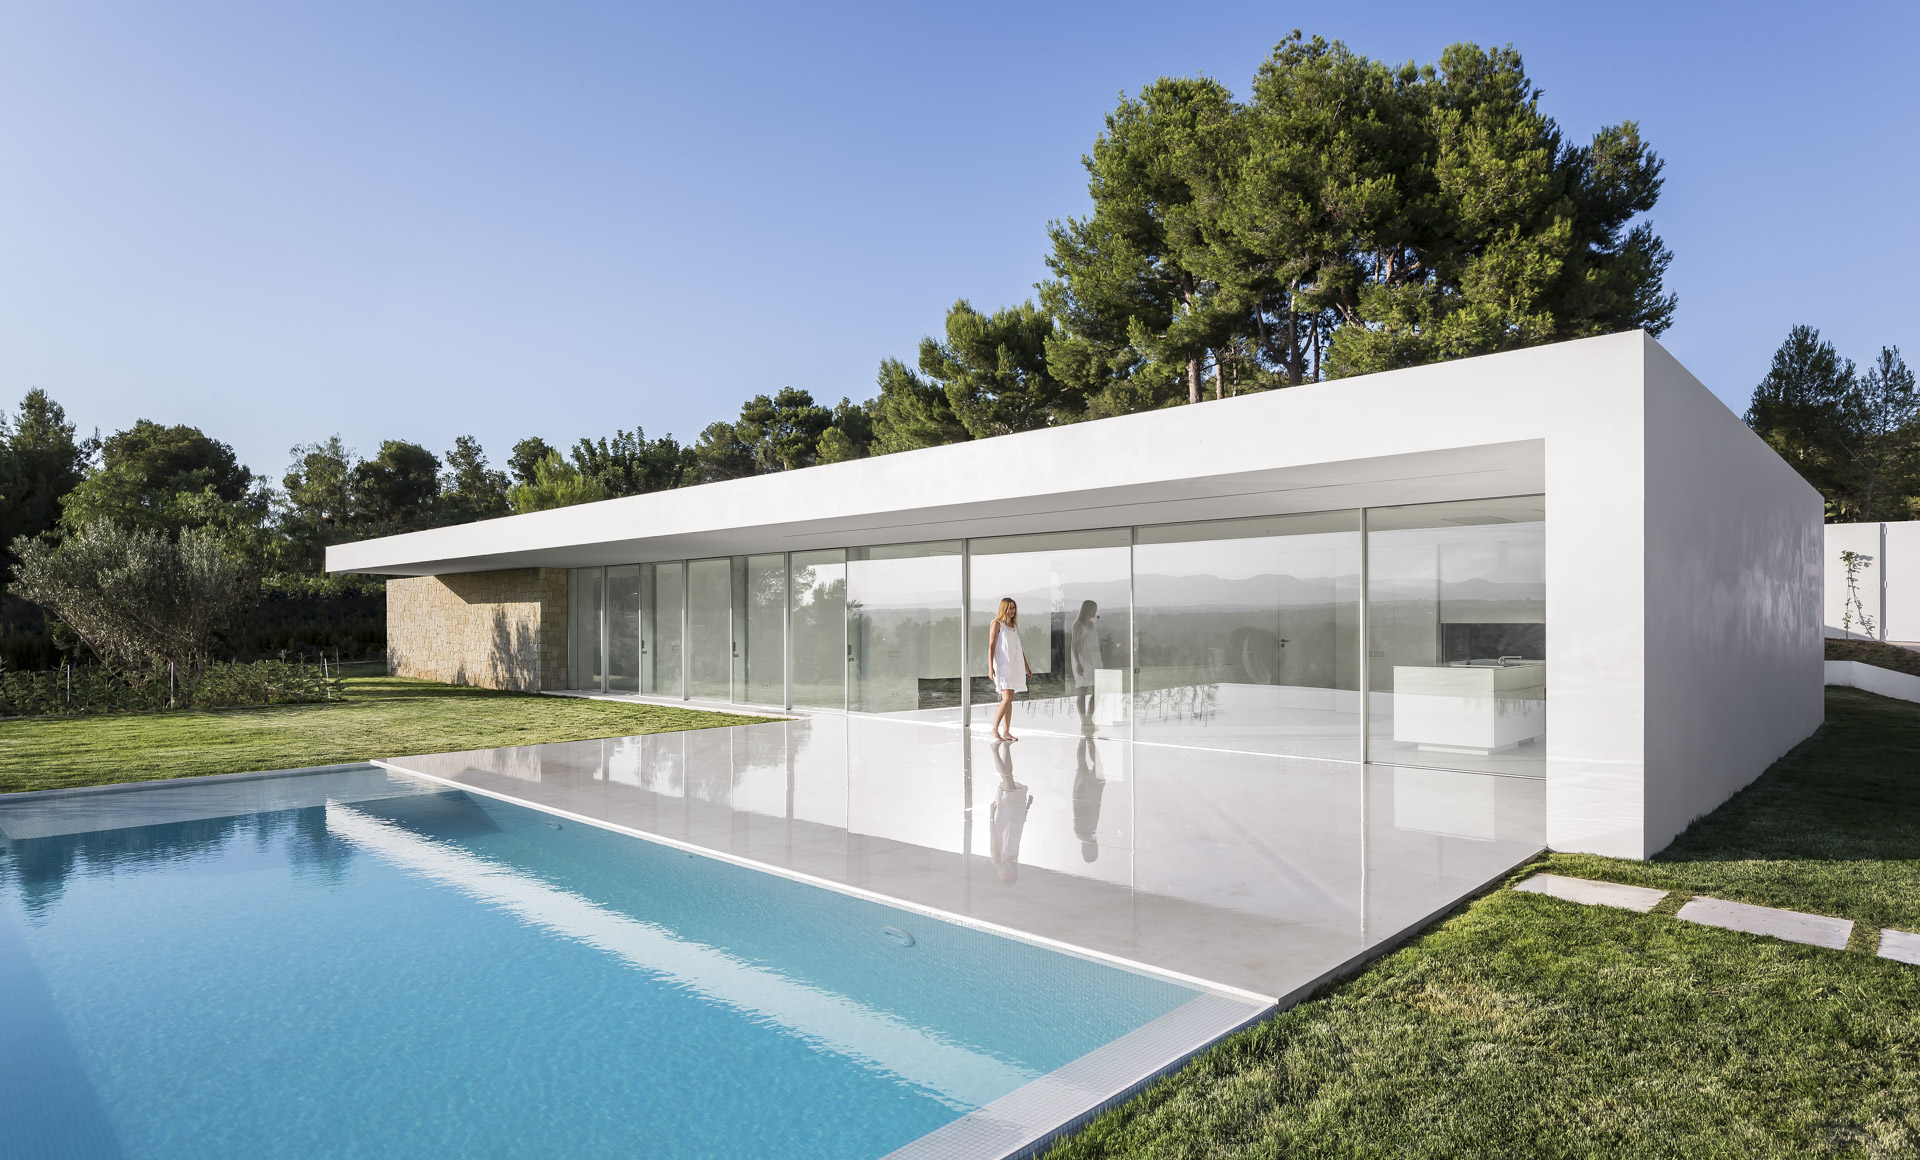 fotografia-arquitectura-valencia-german-cabo-gallardo-llopis-villamarchante-vivienda-40